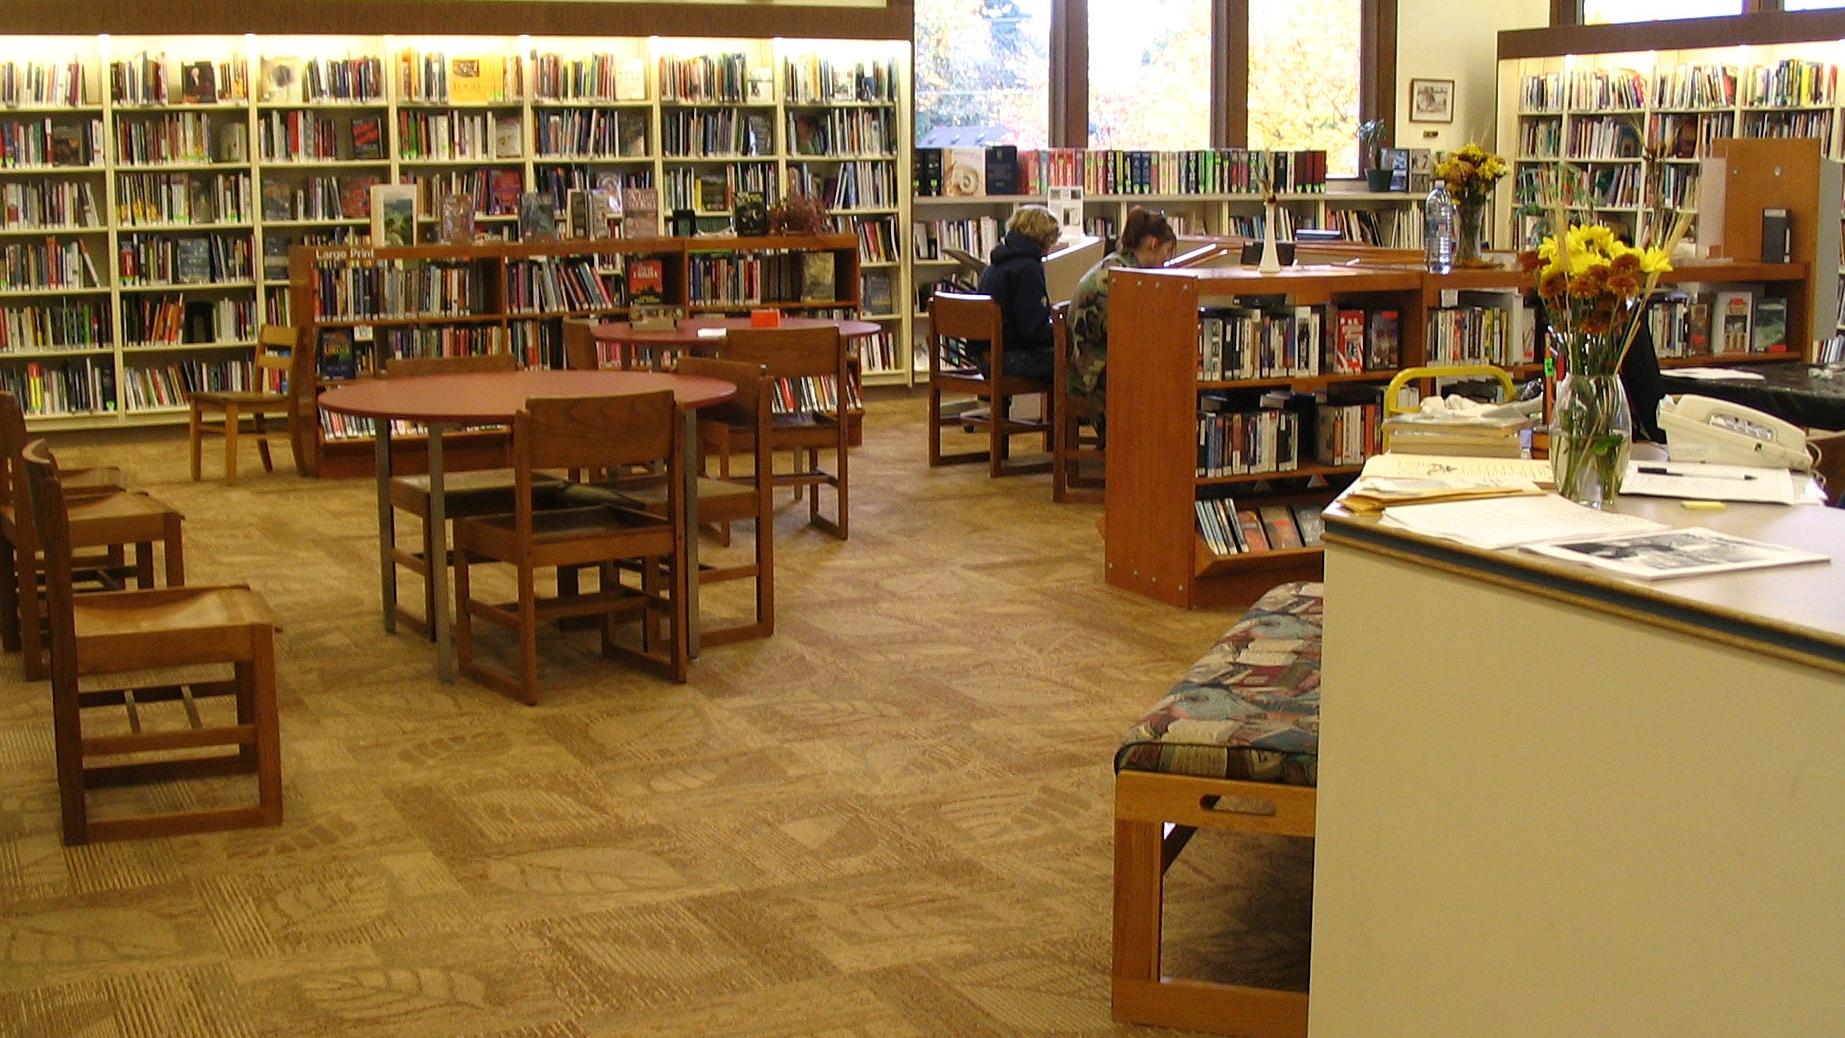 Stevenson_Washington_public_library_interior.jpg